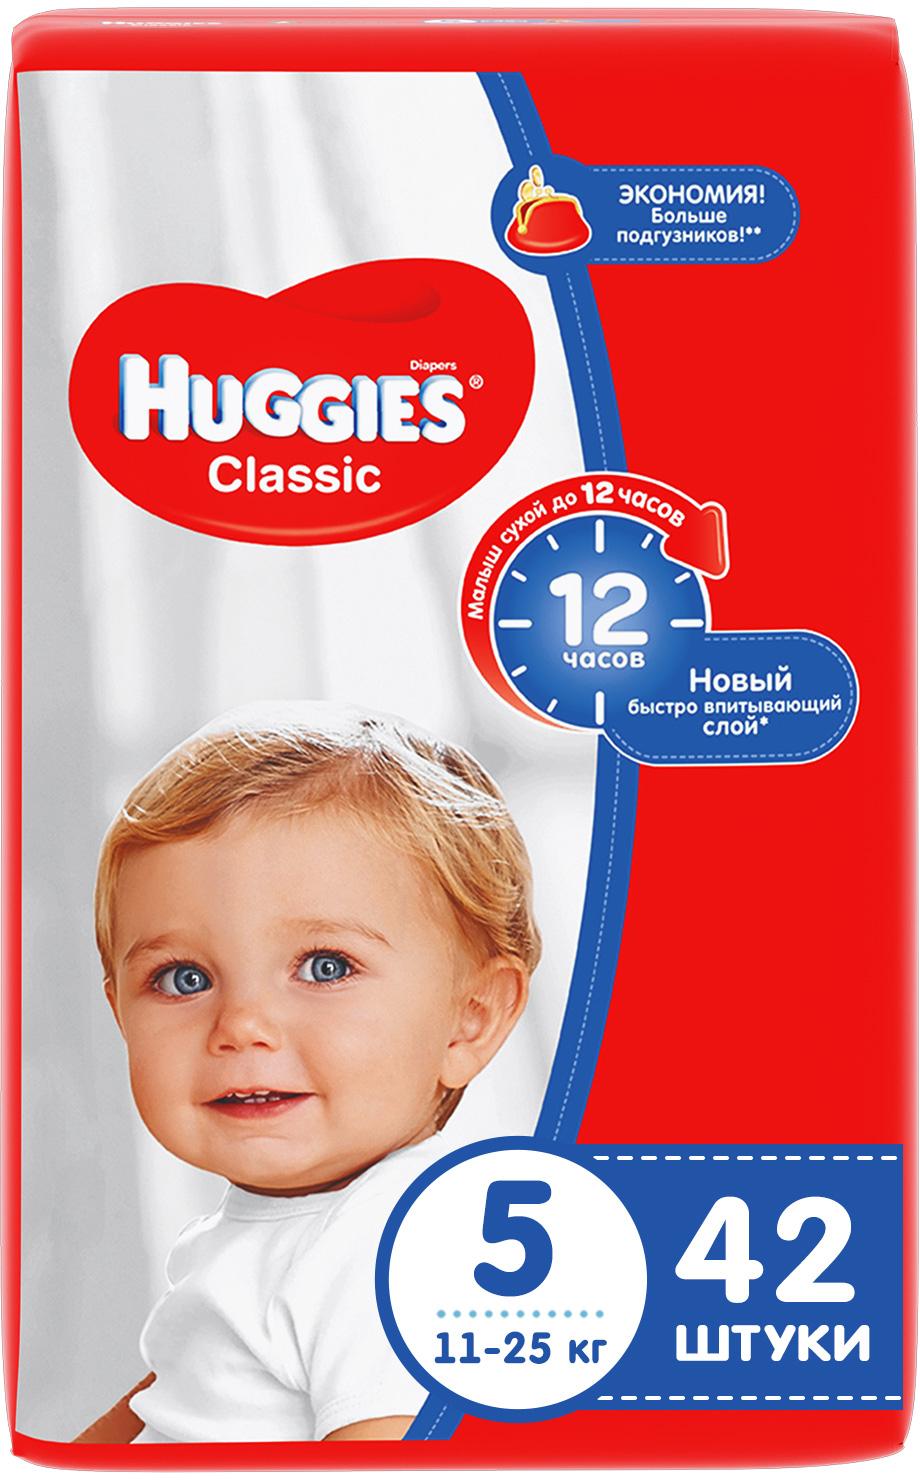 Huggies Подгузники Classic 11-25 кг (размер 5) 42 шт подгузники huggies classic 5 11 25 кг 11 шт